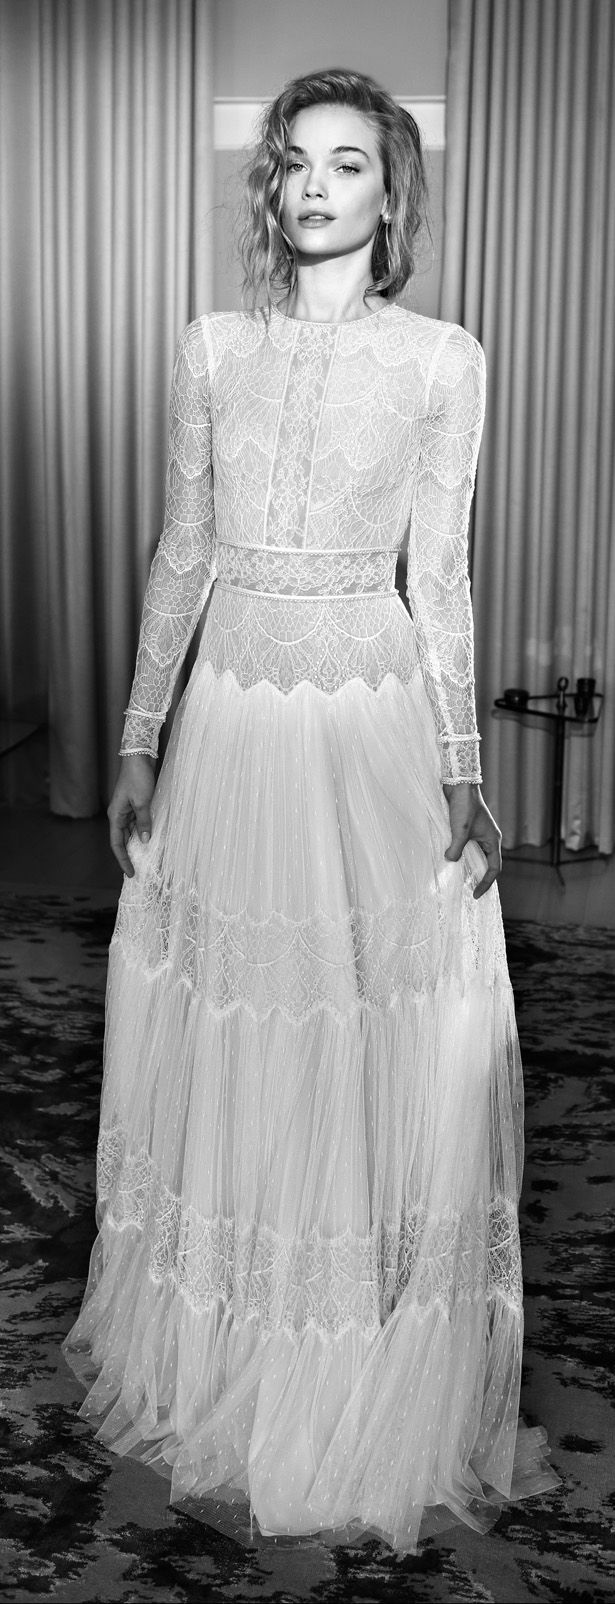 25 best ideas about wedding dress outlet on pinterest for Lihi hod wedding dress for sale